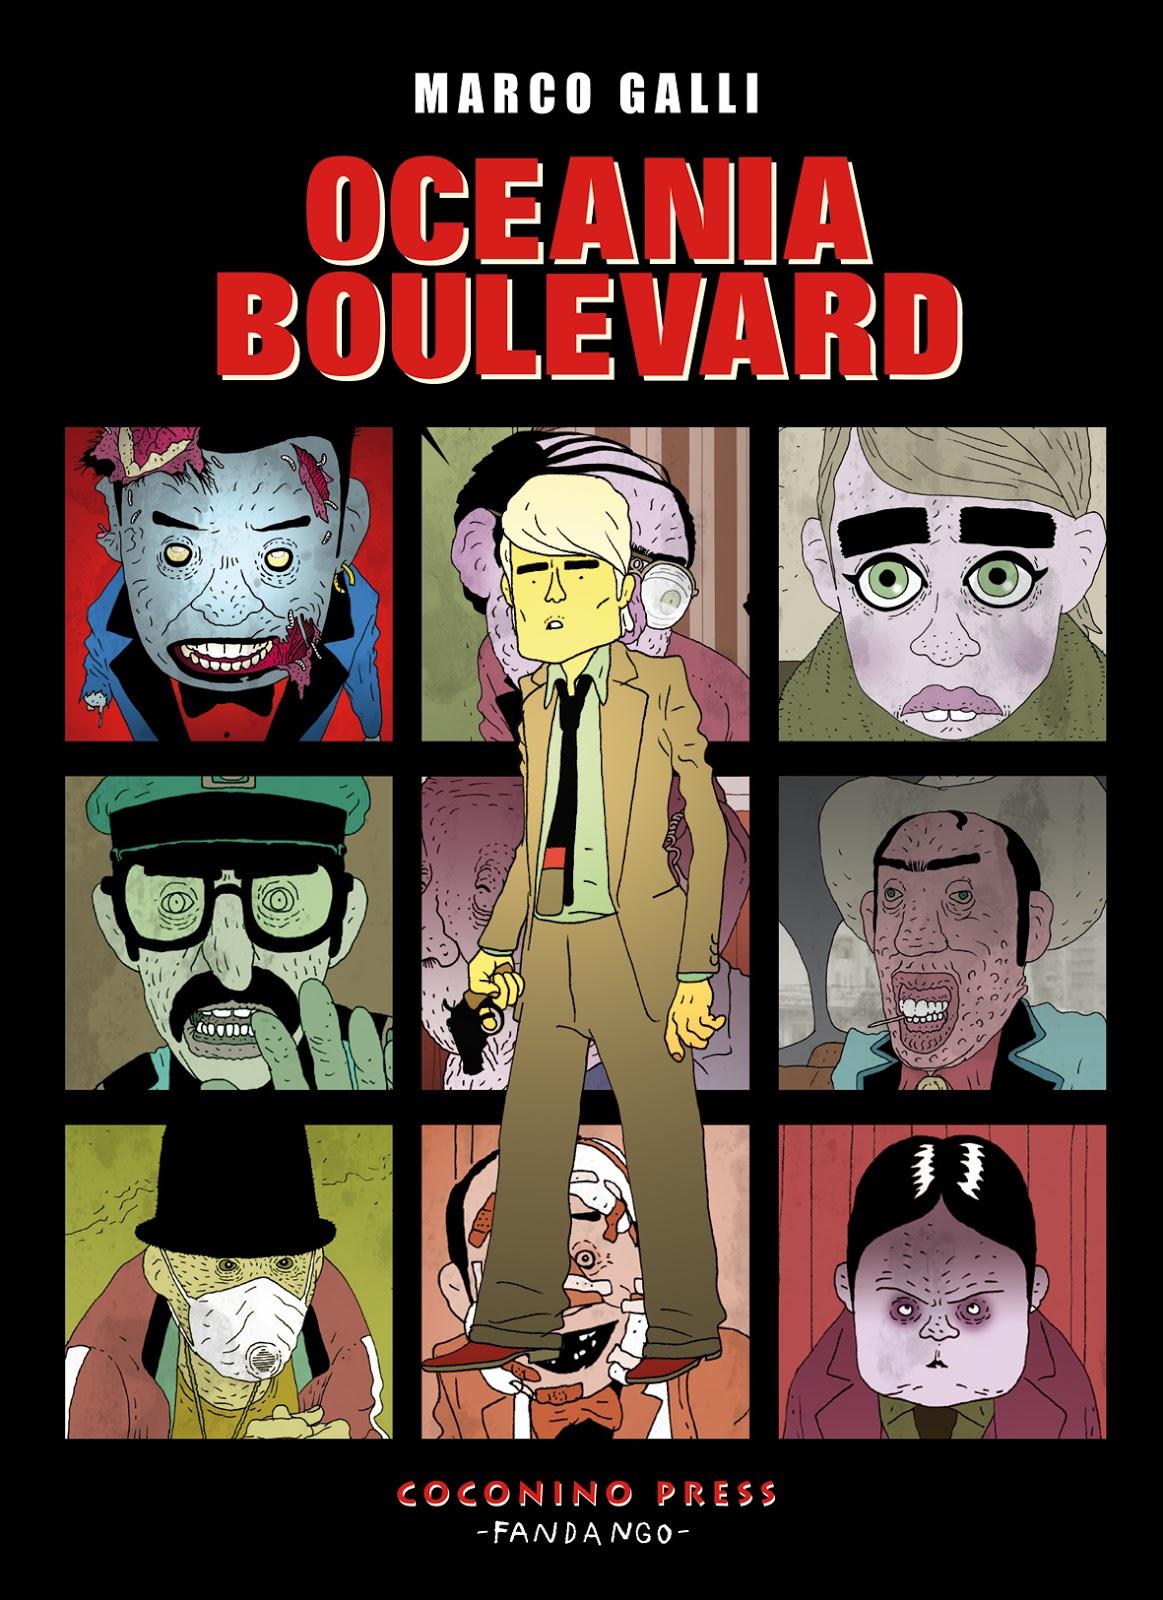 Oceania boulevard Book Cover